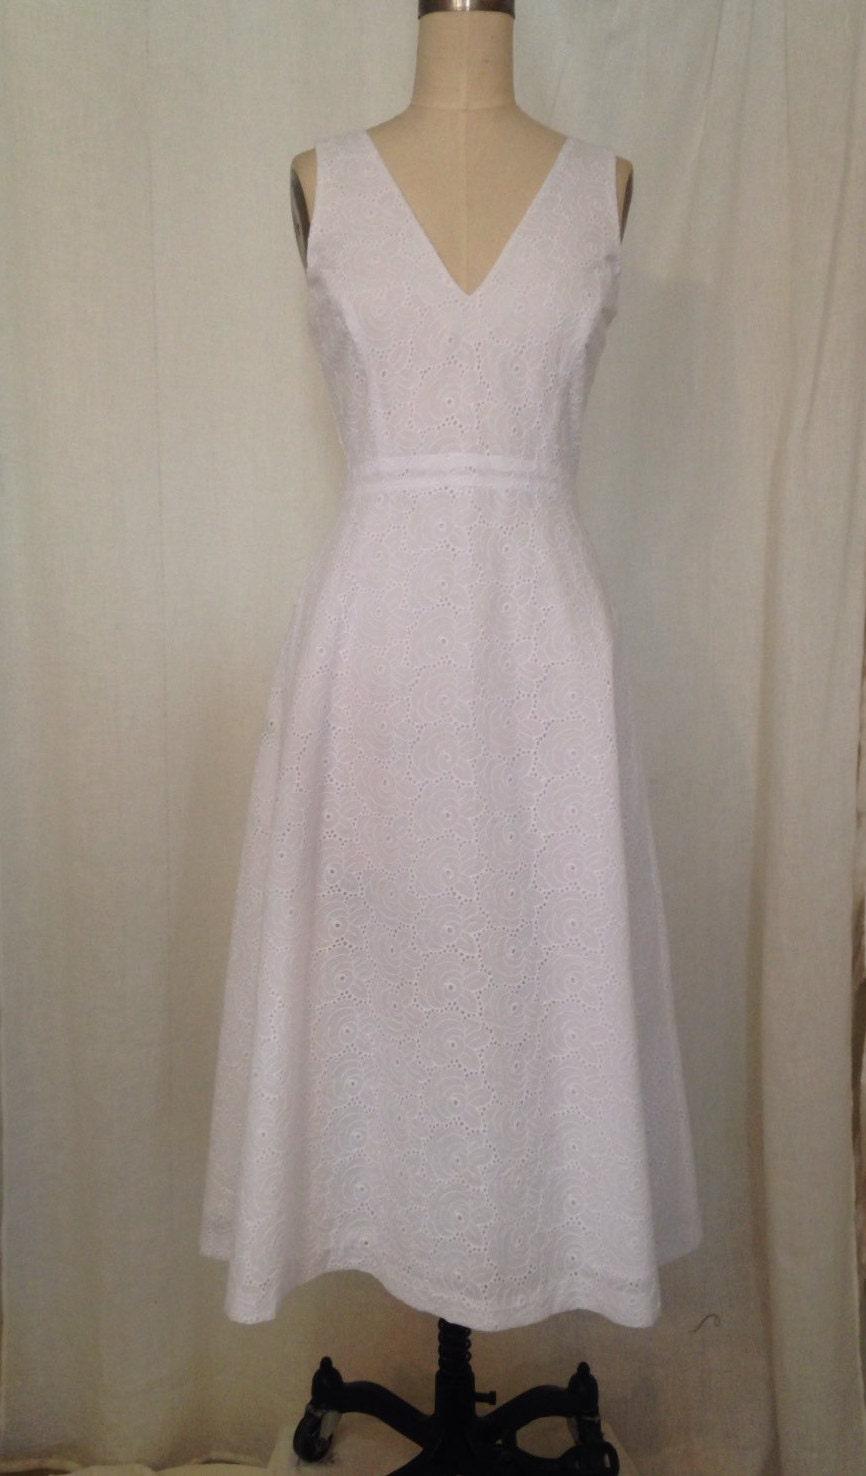 White Cotton Eyelet V Neck A Line Midi Dress Size Small